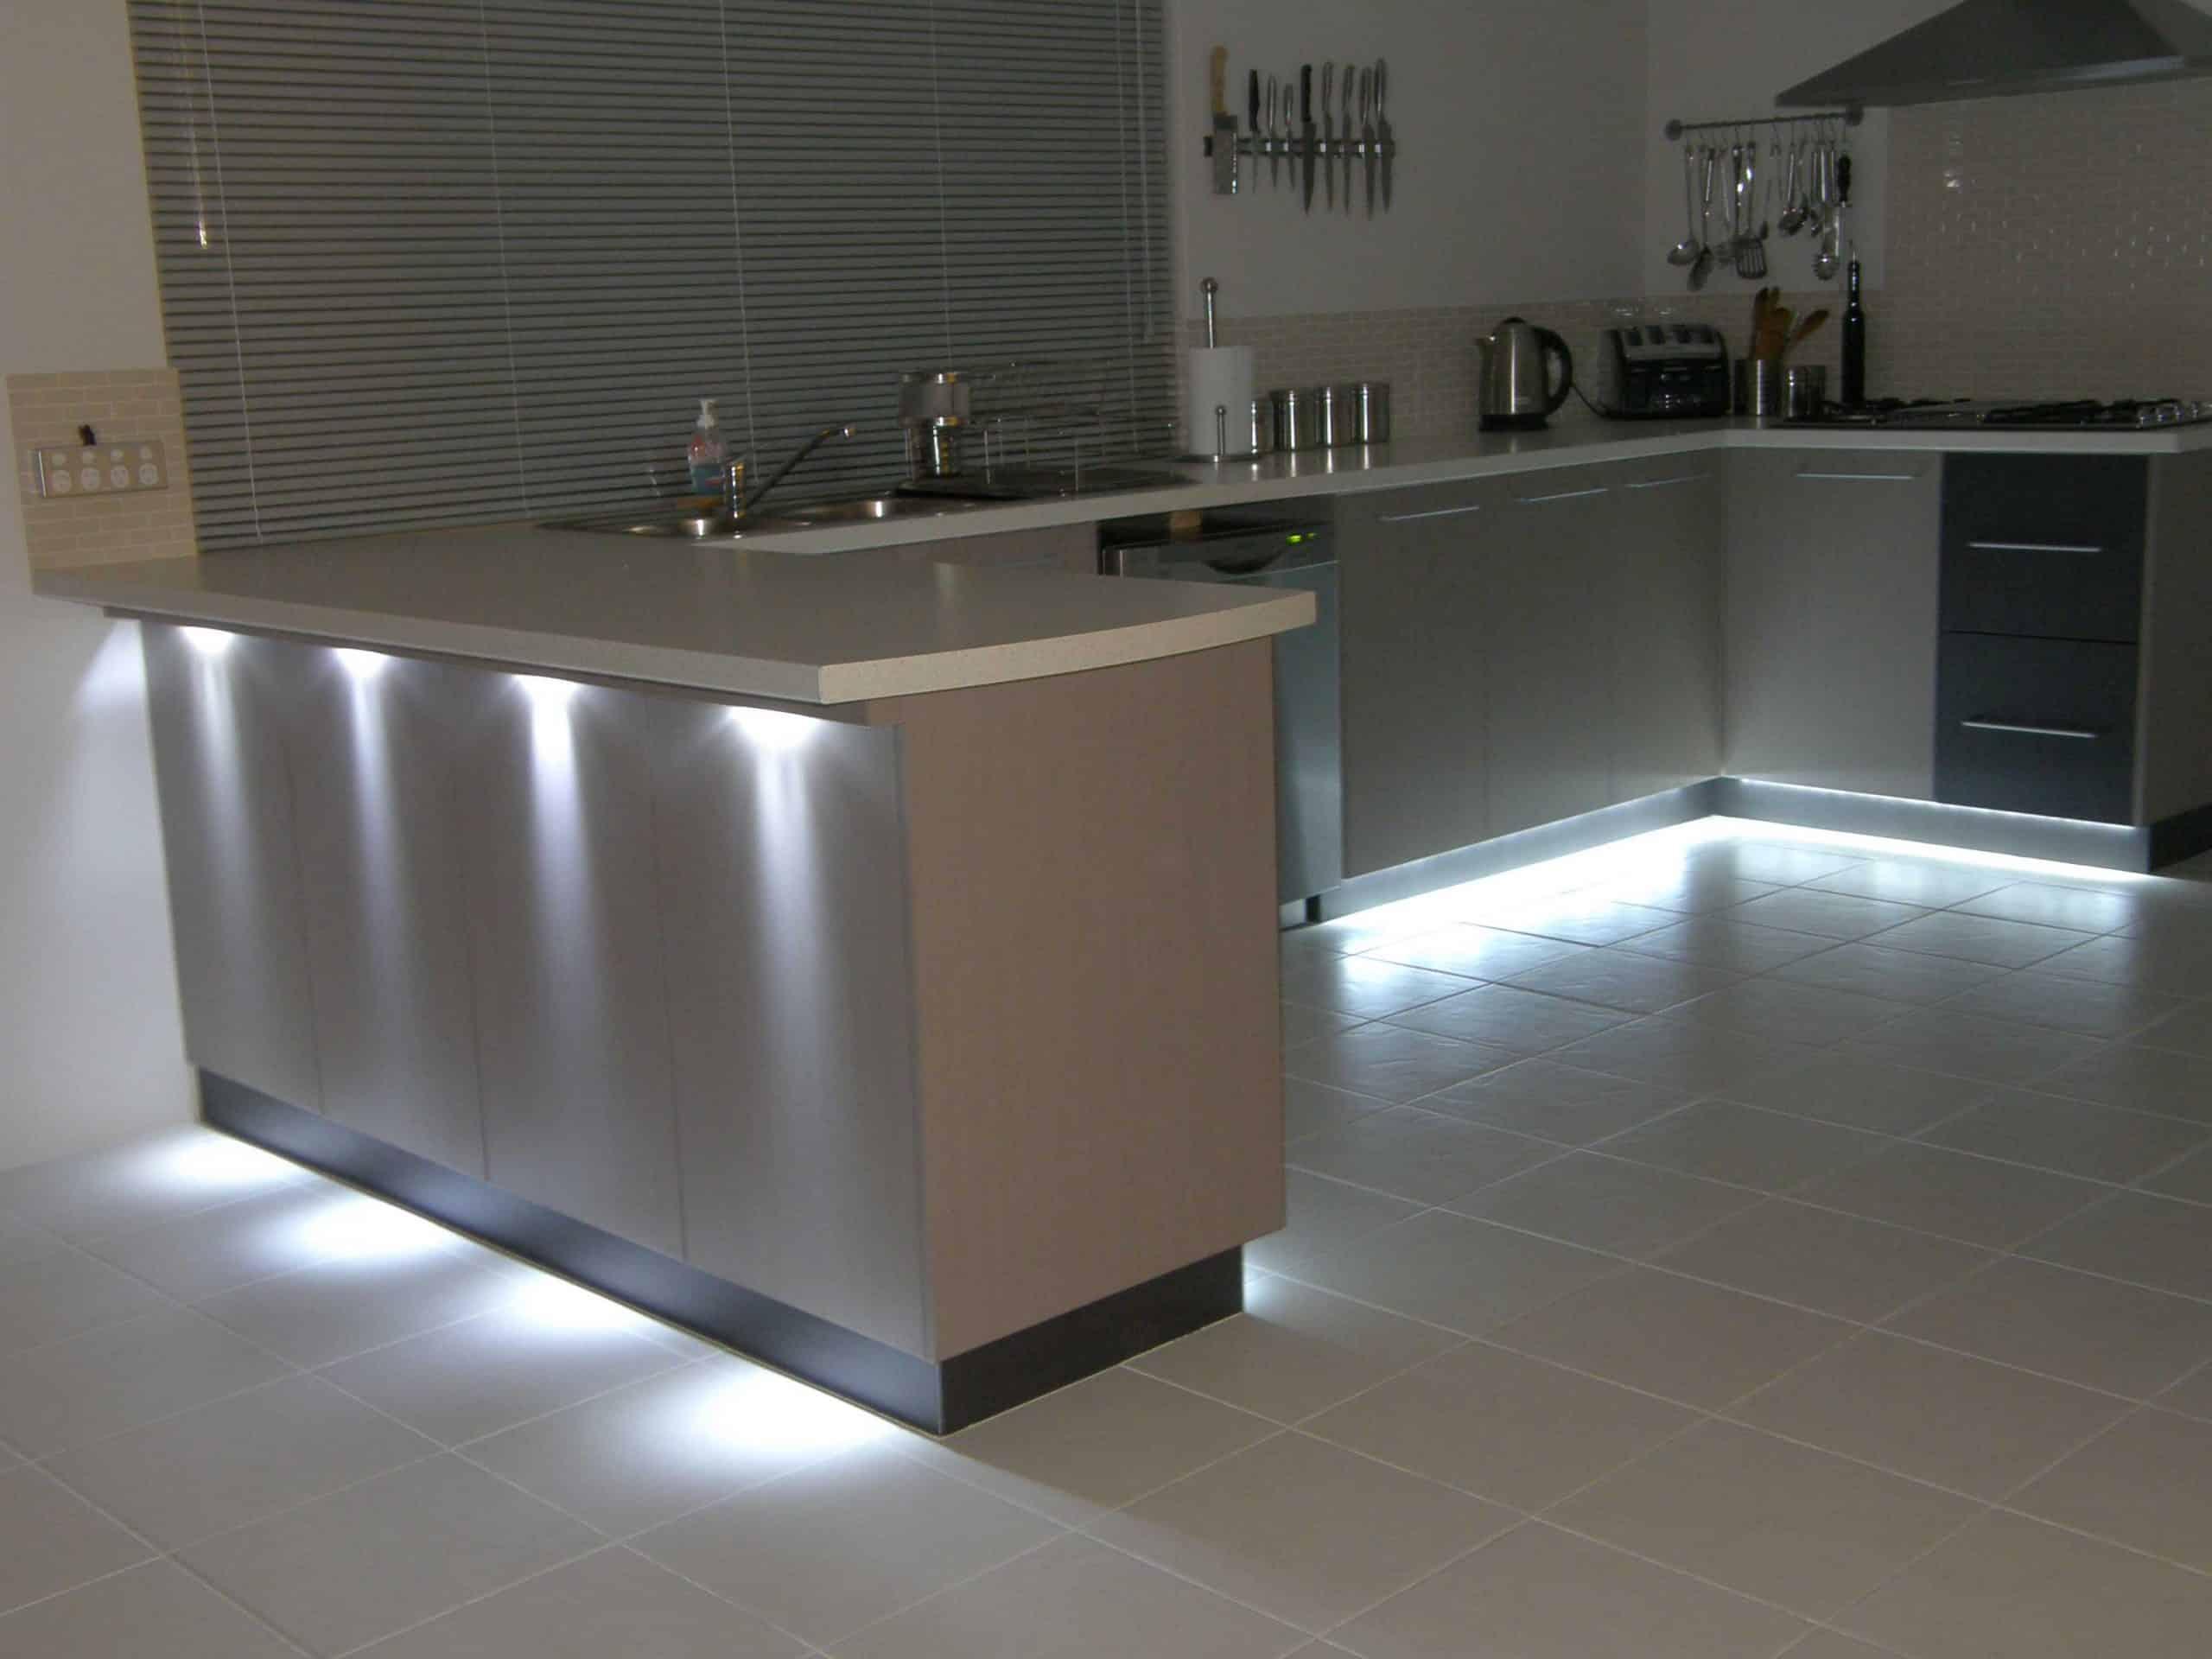 Kitchen Countertop Lighting 29 Inspiring Kitchen Lighting Ideas Designbump